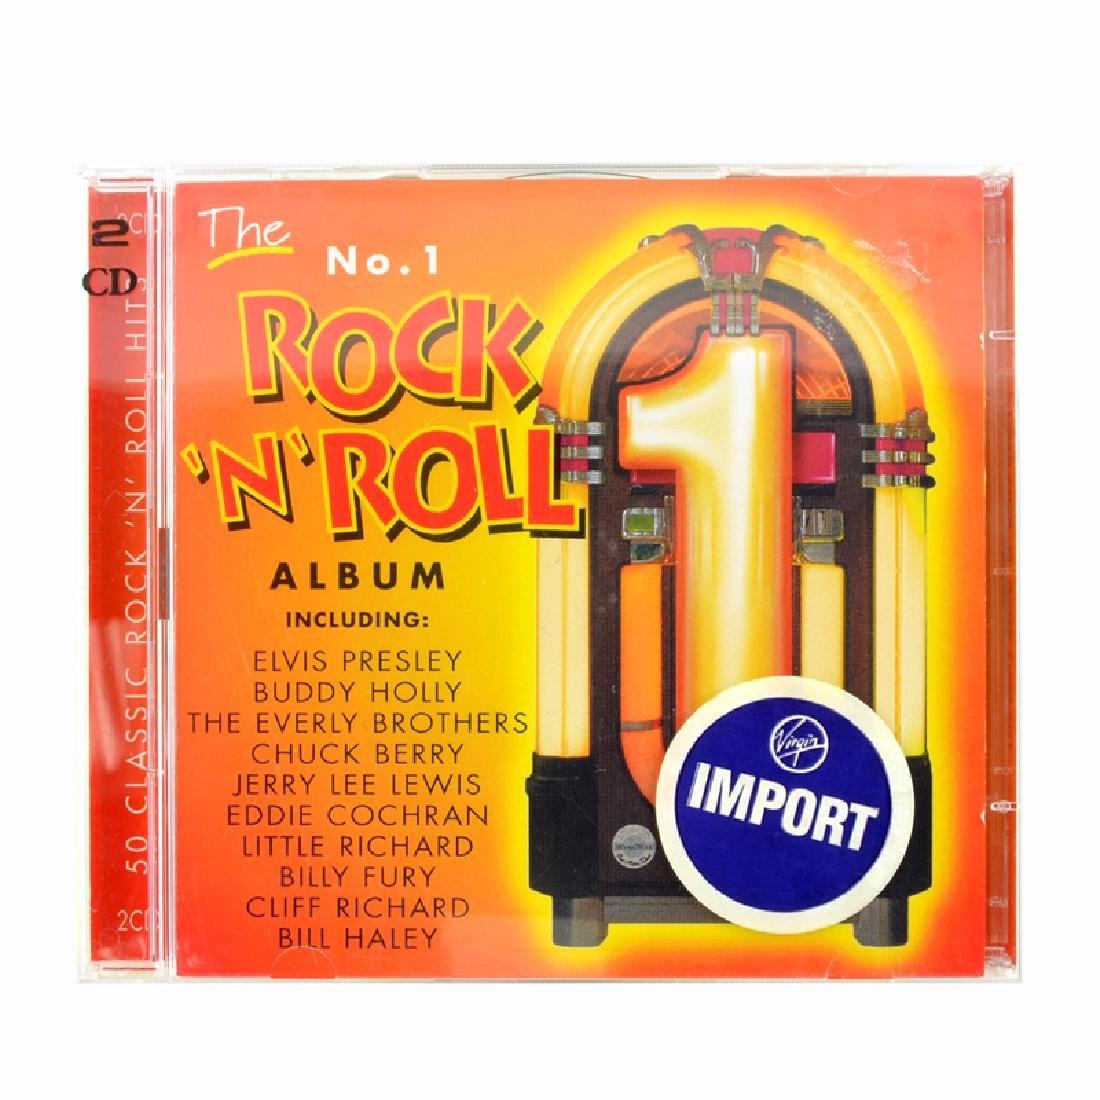 The No. 1 Rock 'N' Roll Album CDs